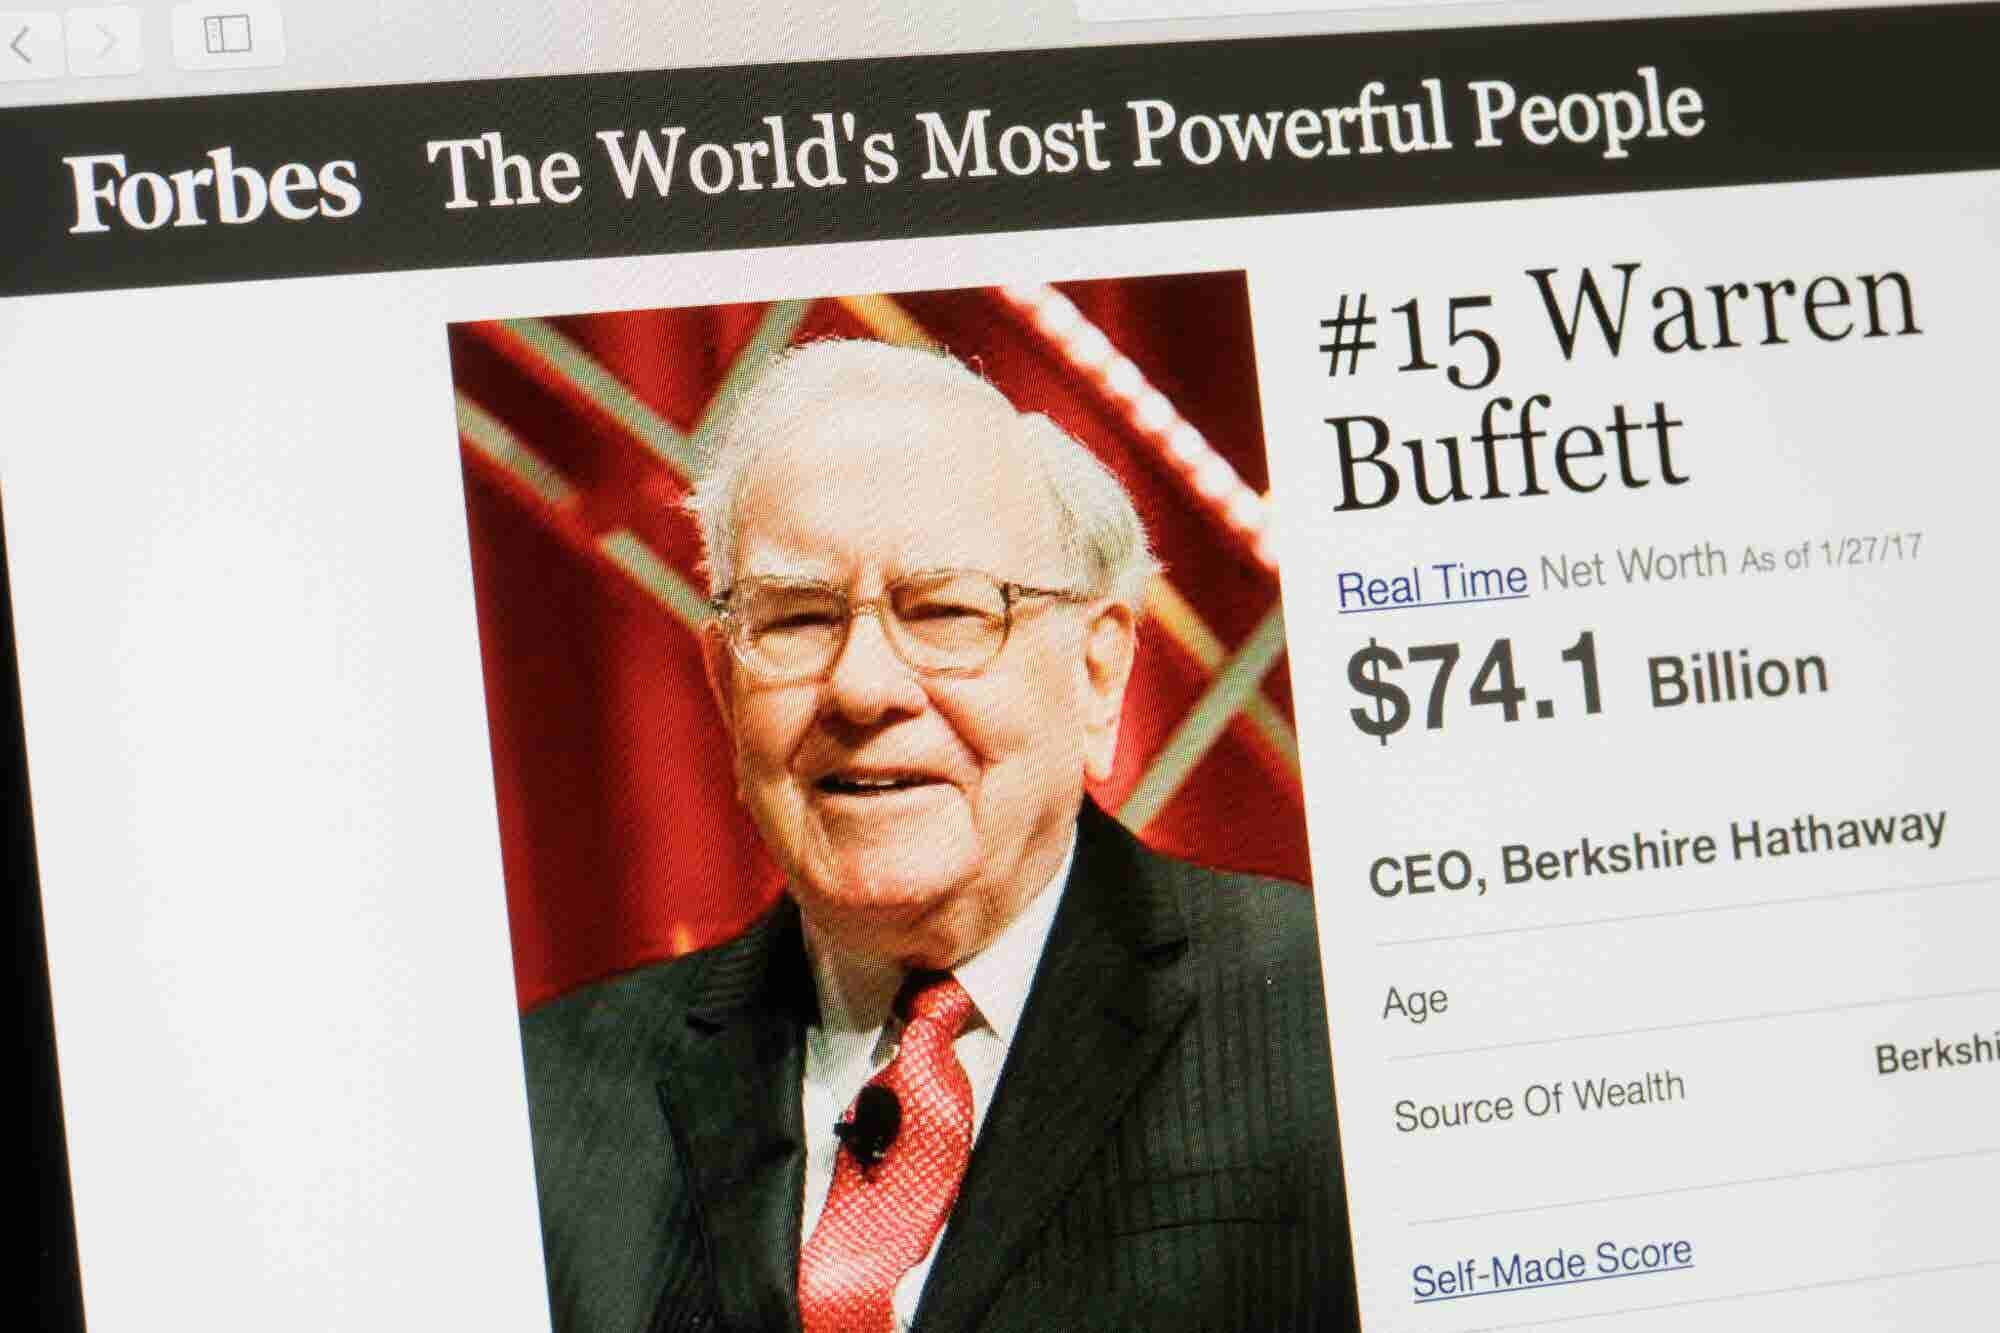 Video: ¿Quién es Warren Buffett?